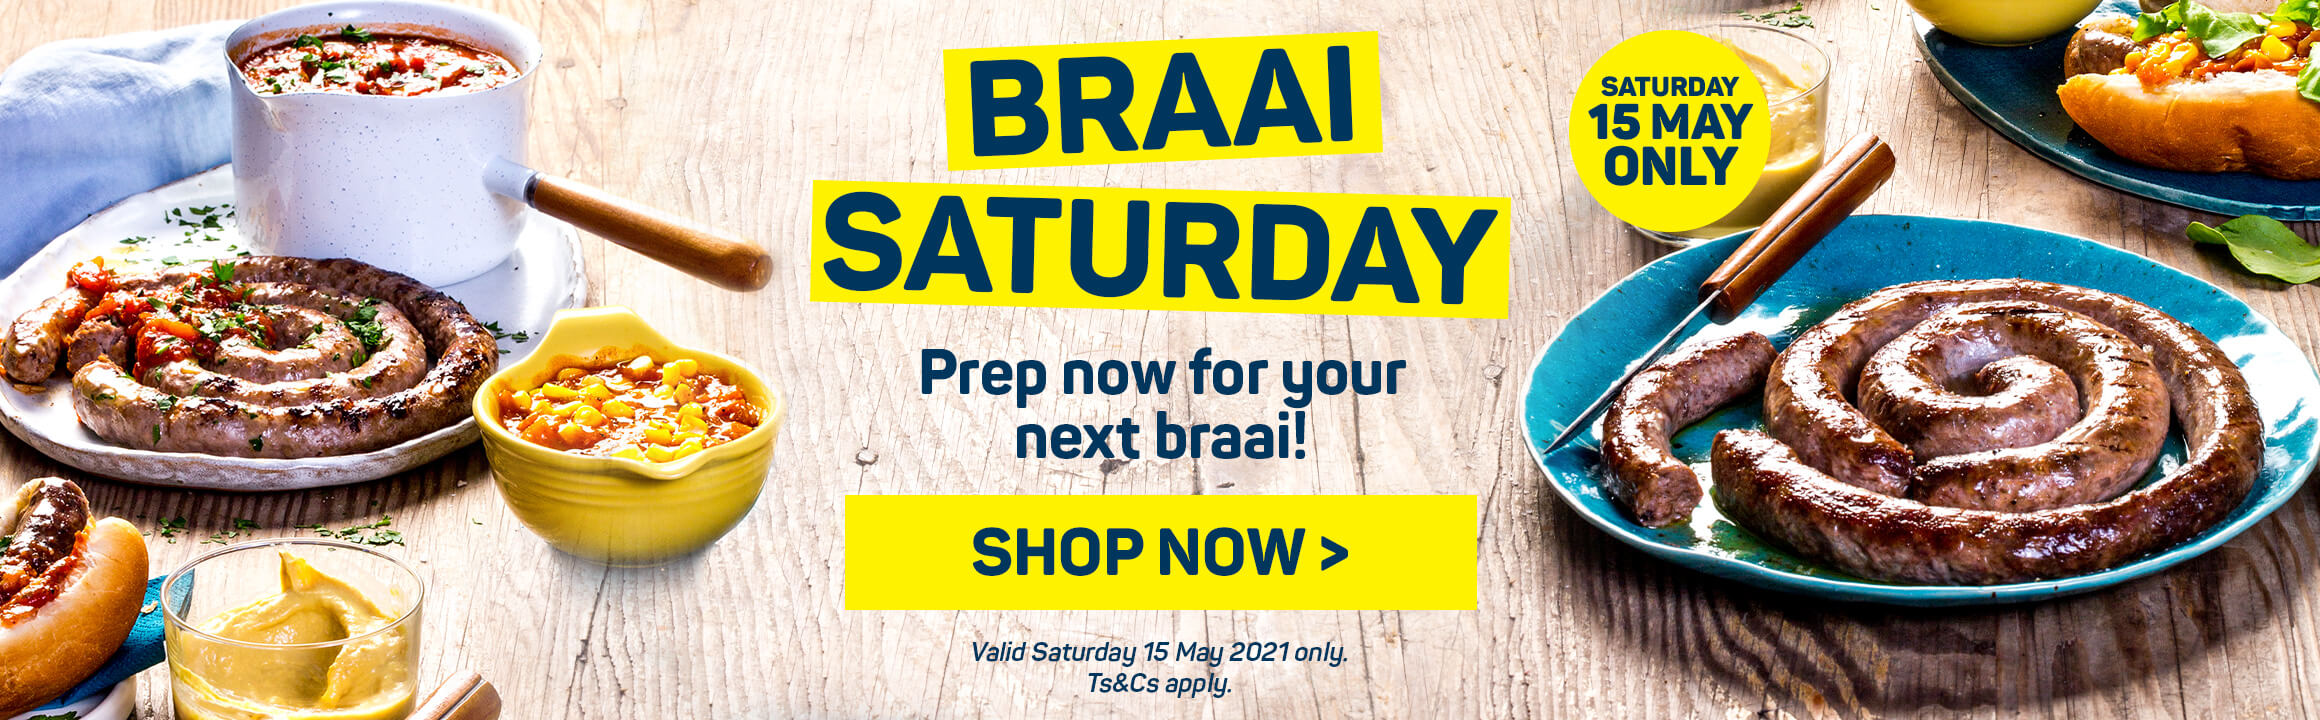 Braai Saturday. Shop now